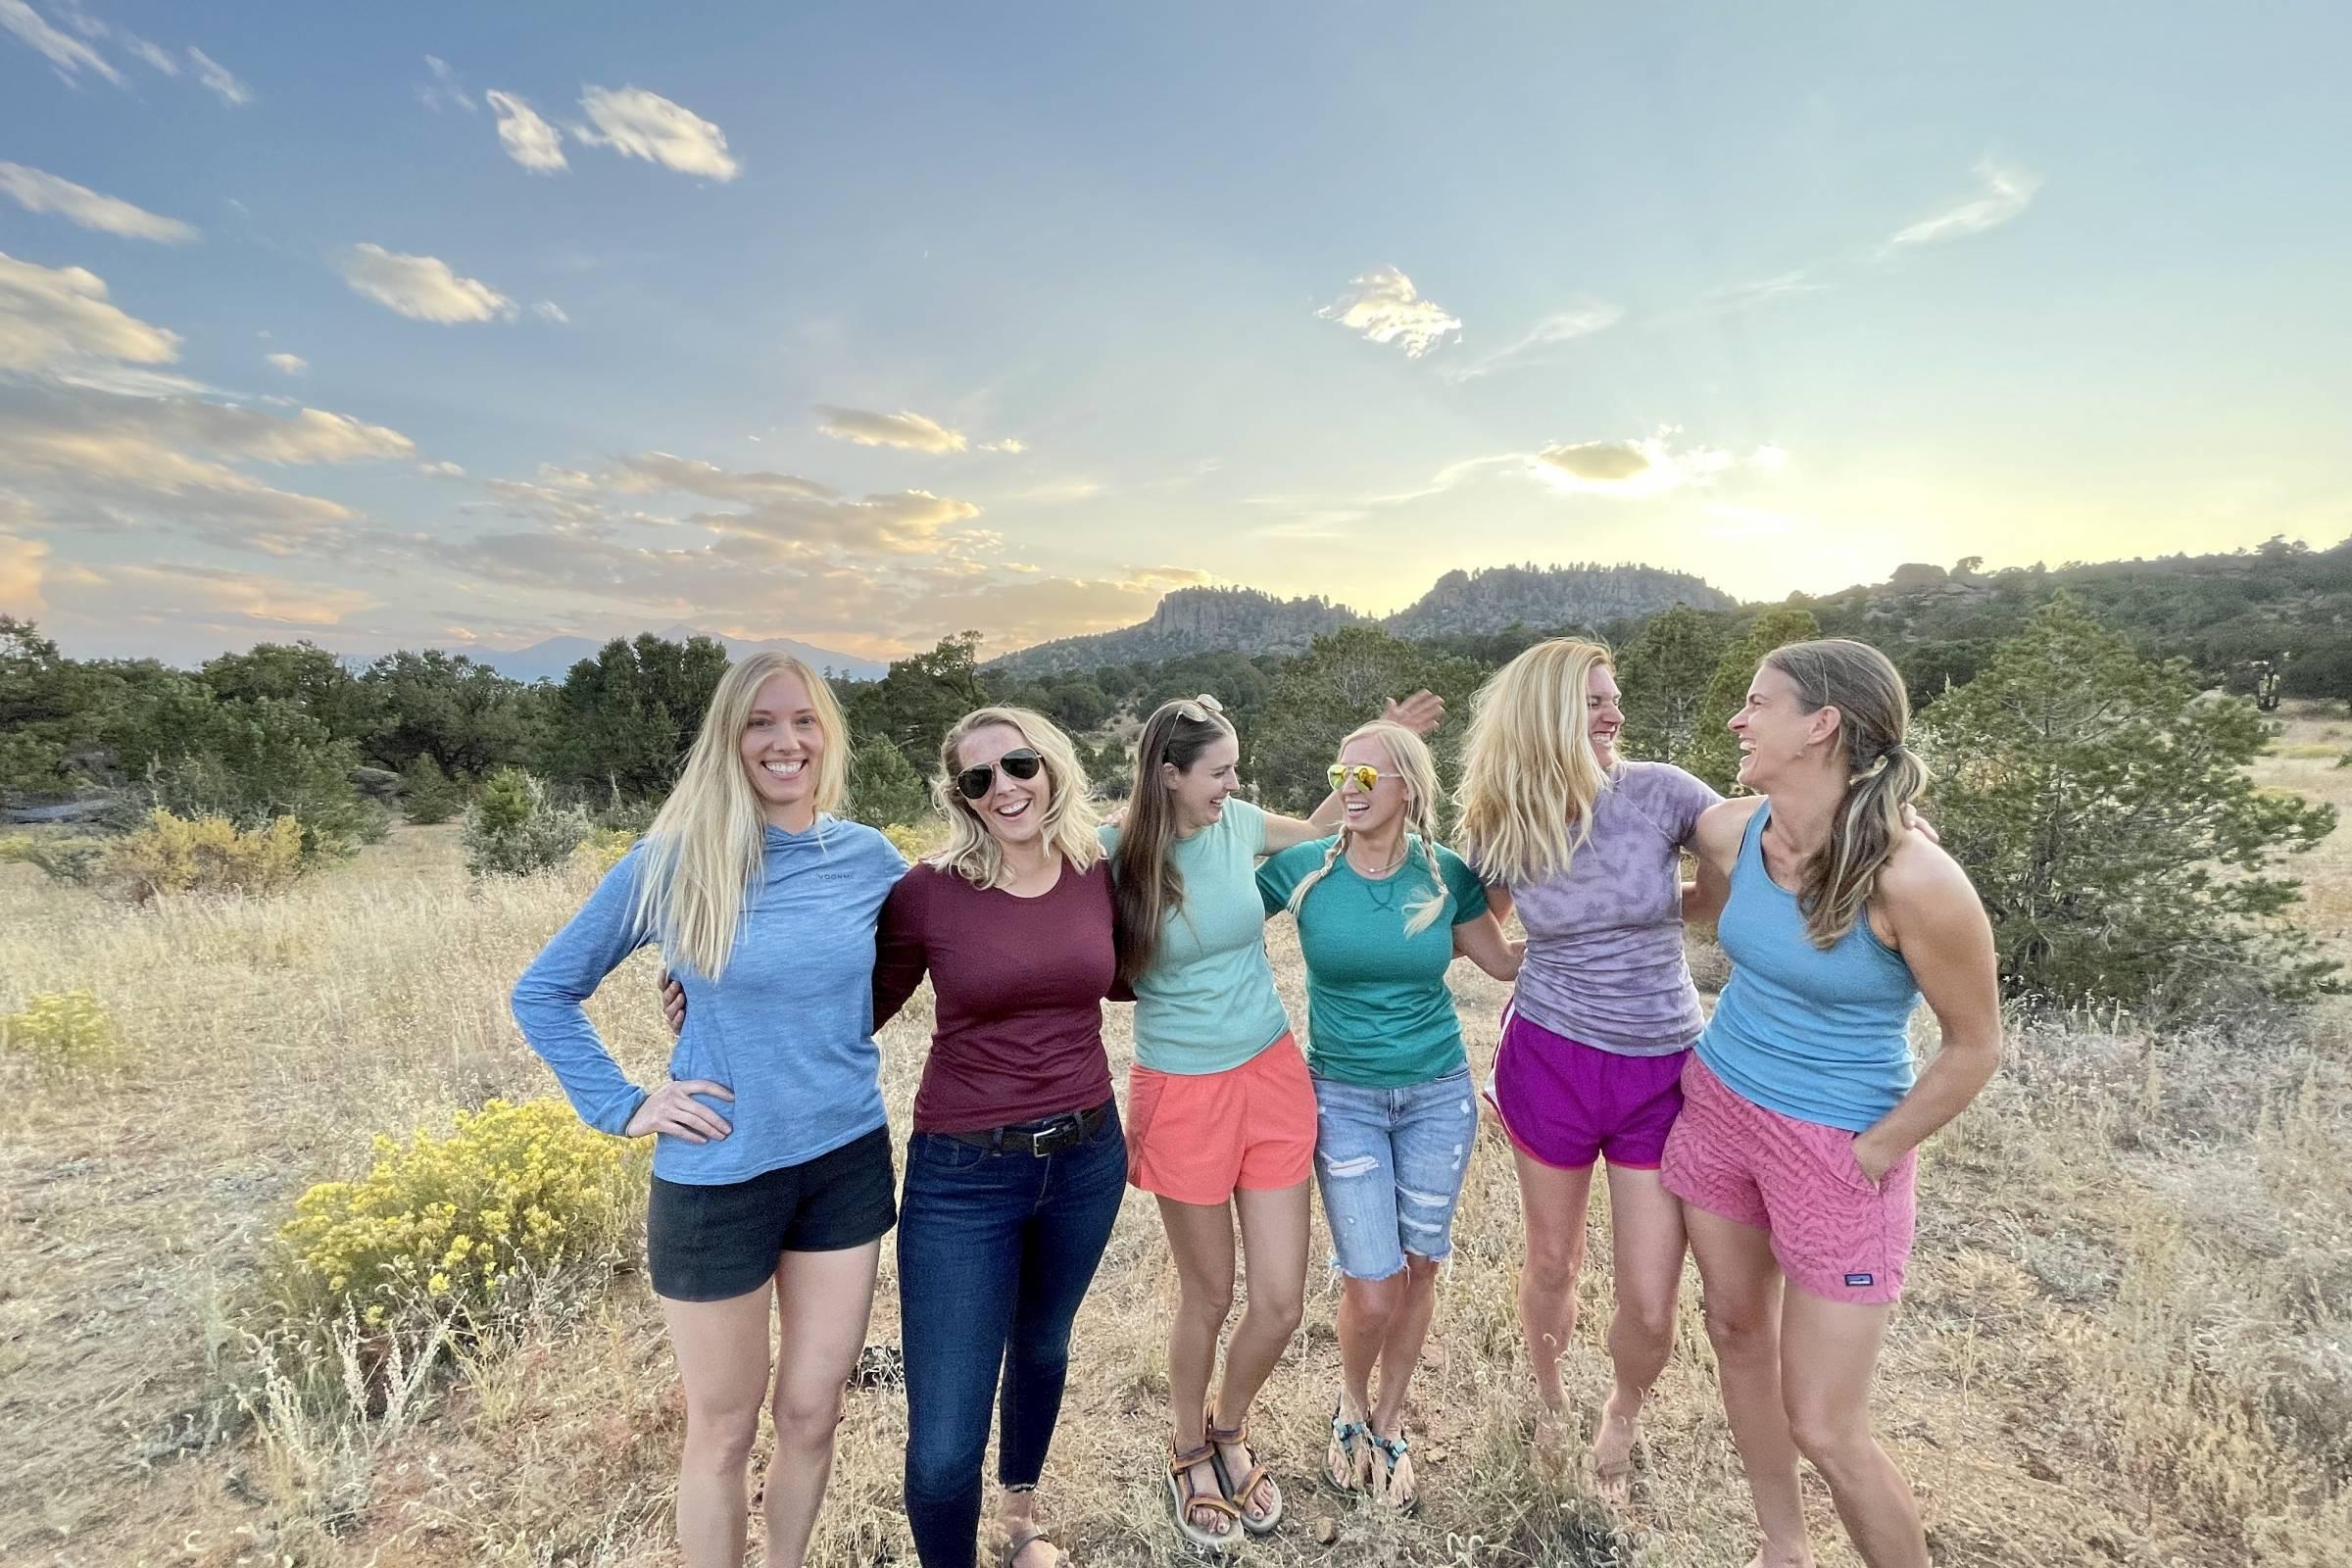 six women in six different styles of merino shirts